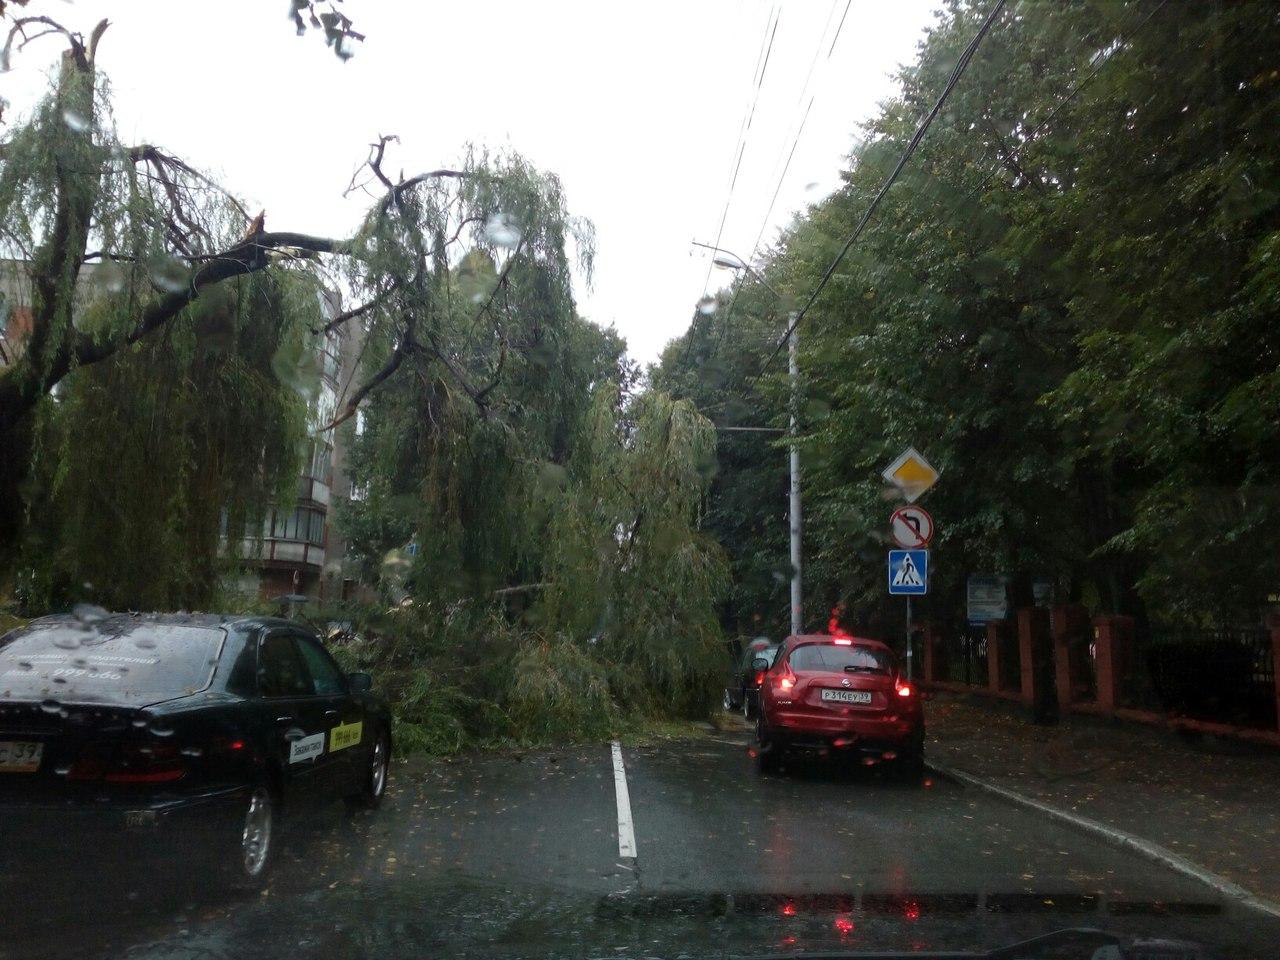 ВКалининградской области устраняют последствия шторма